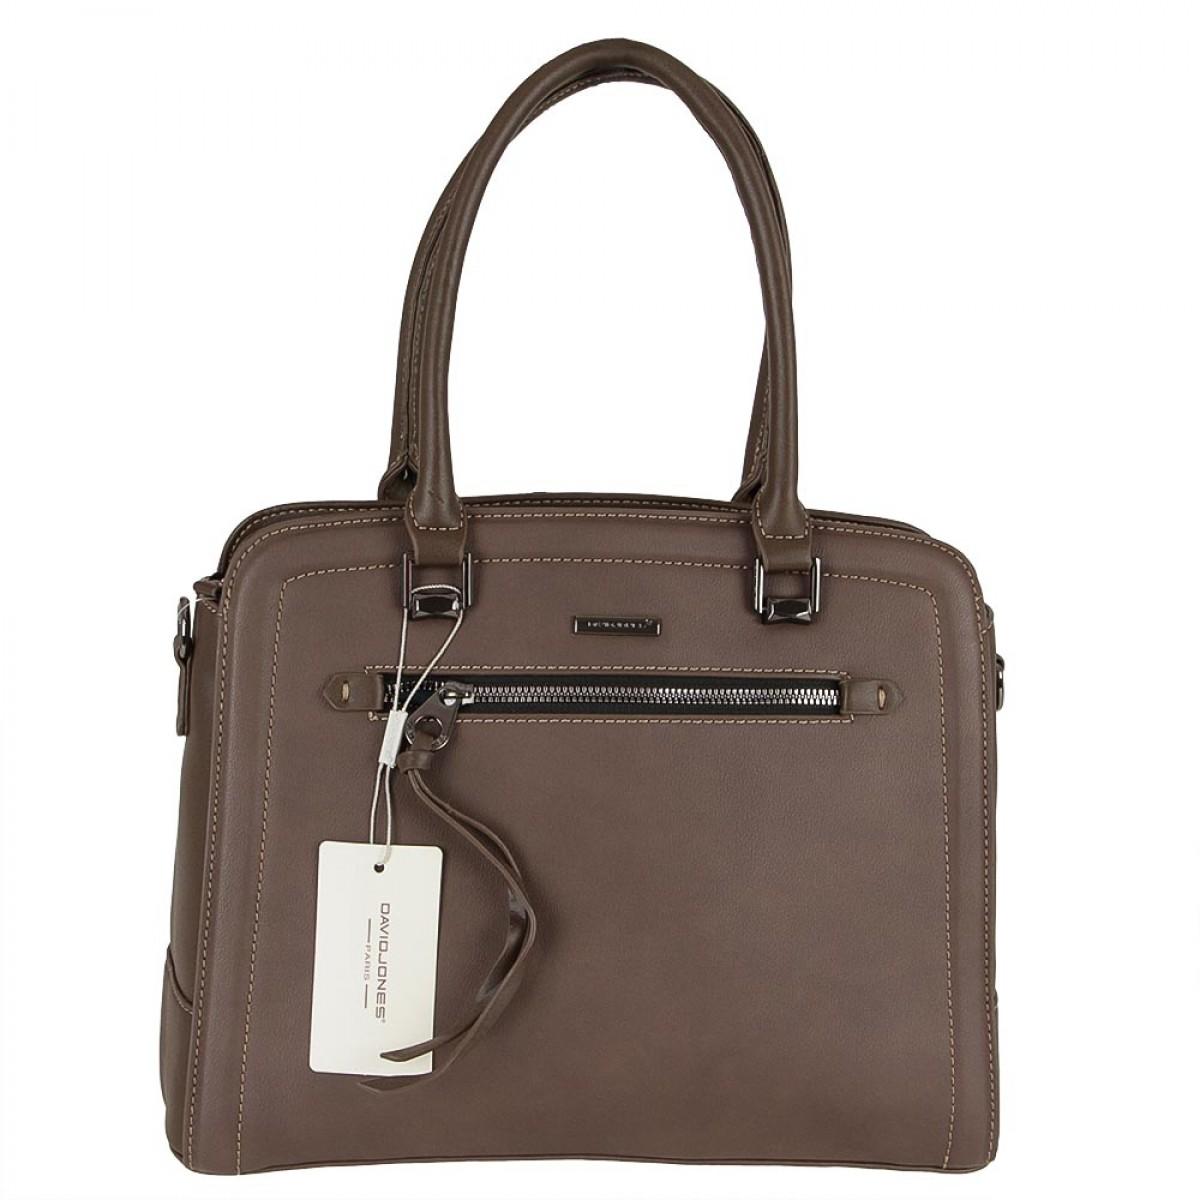 Жіноча сумка David Jones 6111-3 D.BROWN